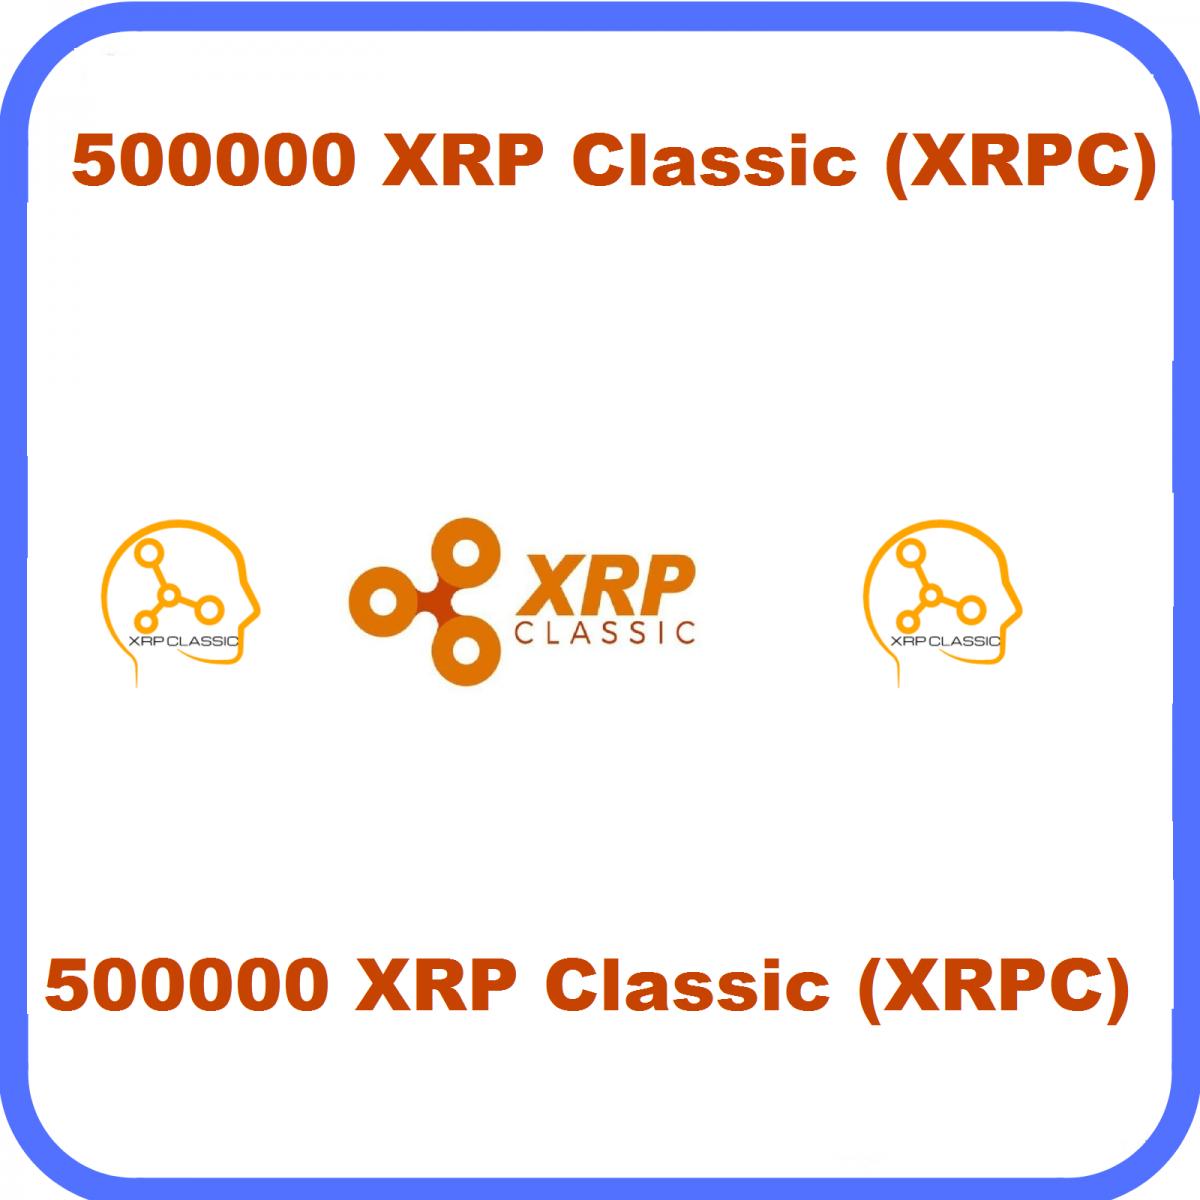 XRP Classic (XRPC)